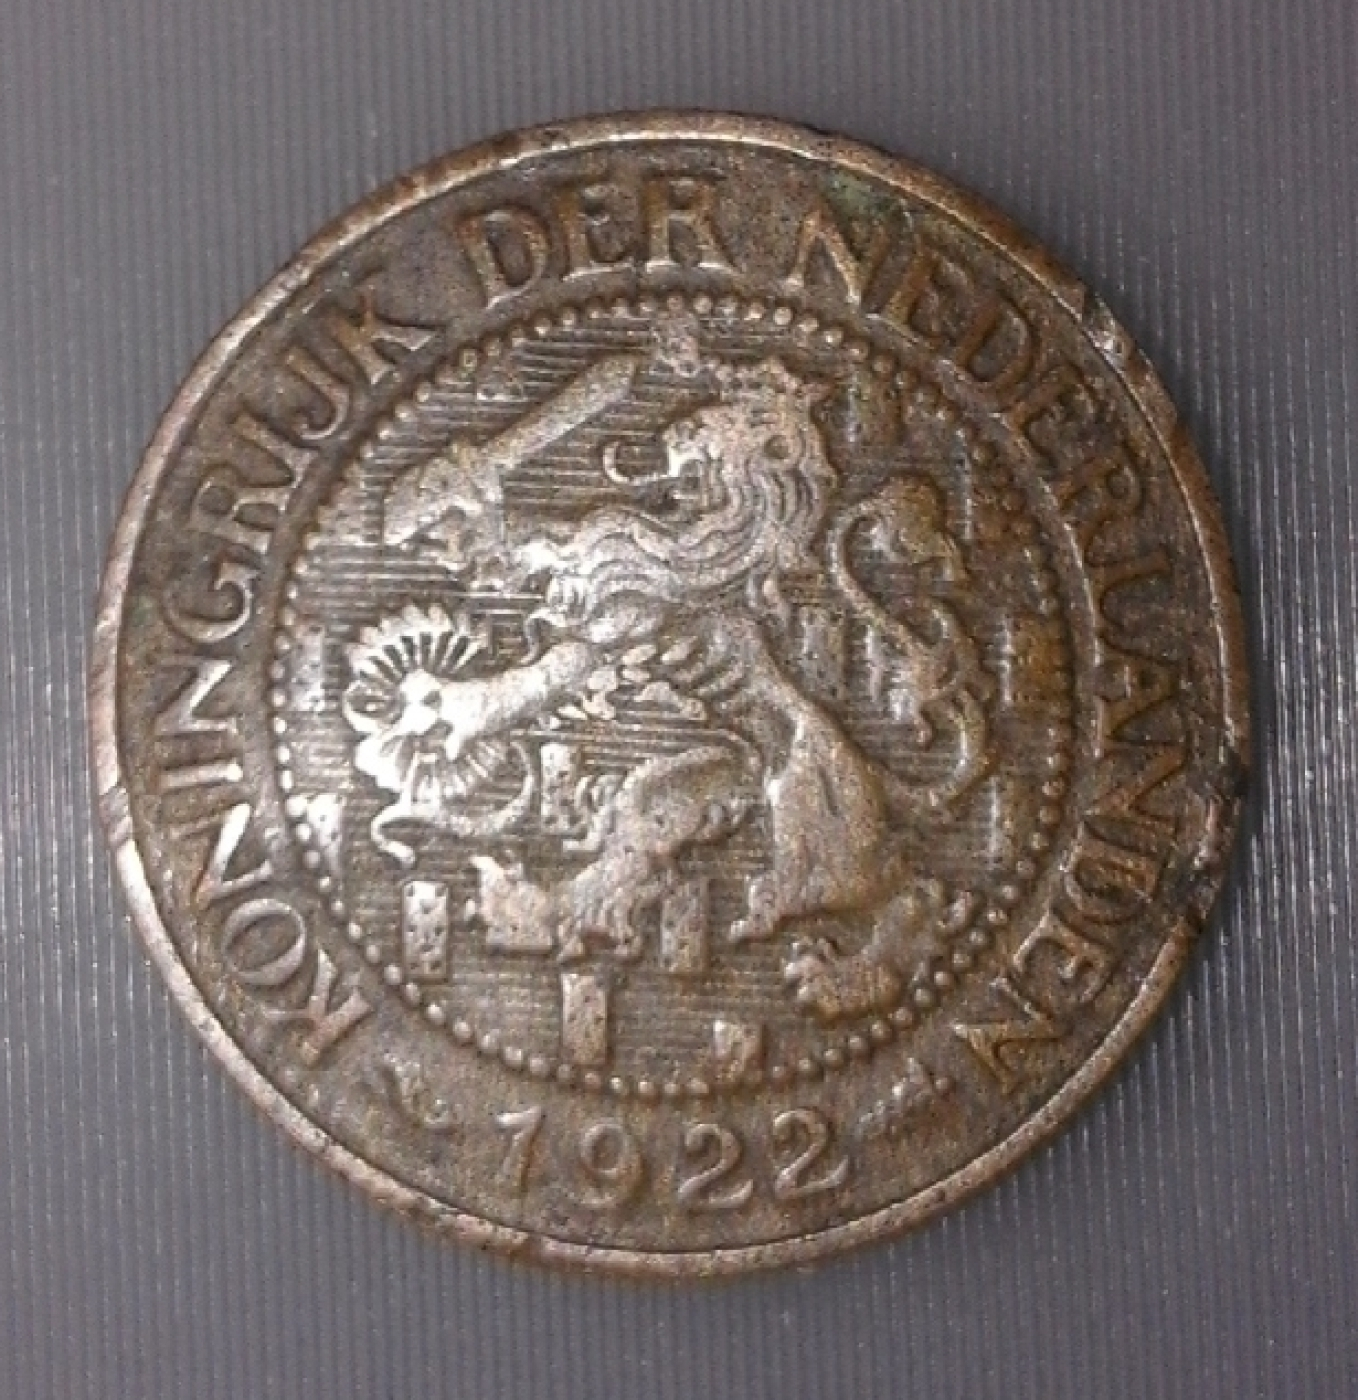 1 Cent 1922 Wilhelmina I 1911 1930 Netherlands Coin 37805